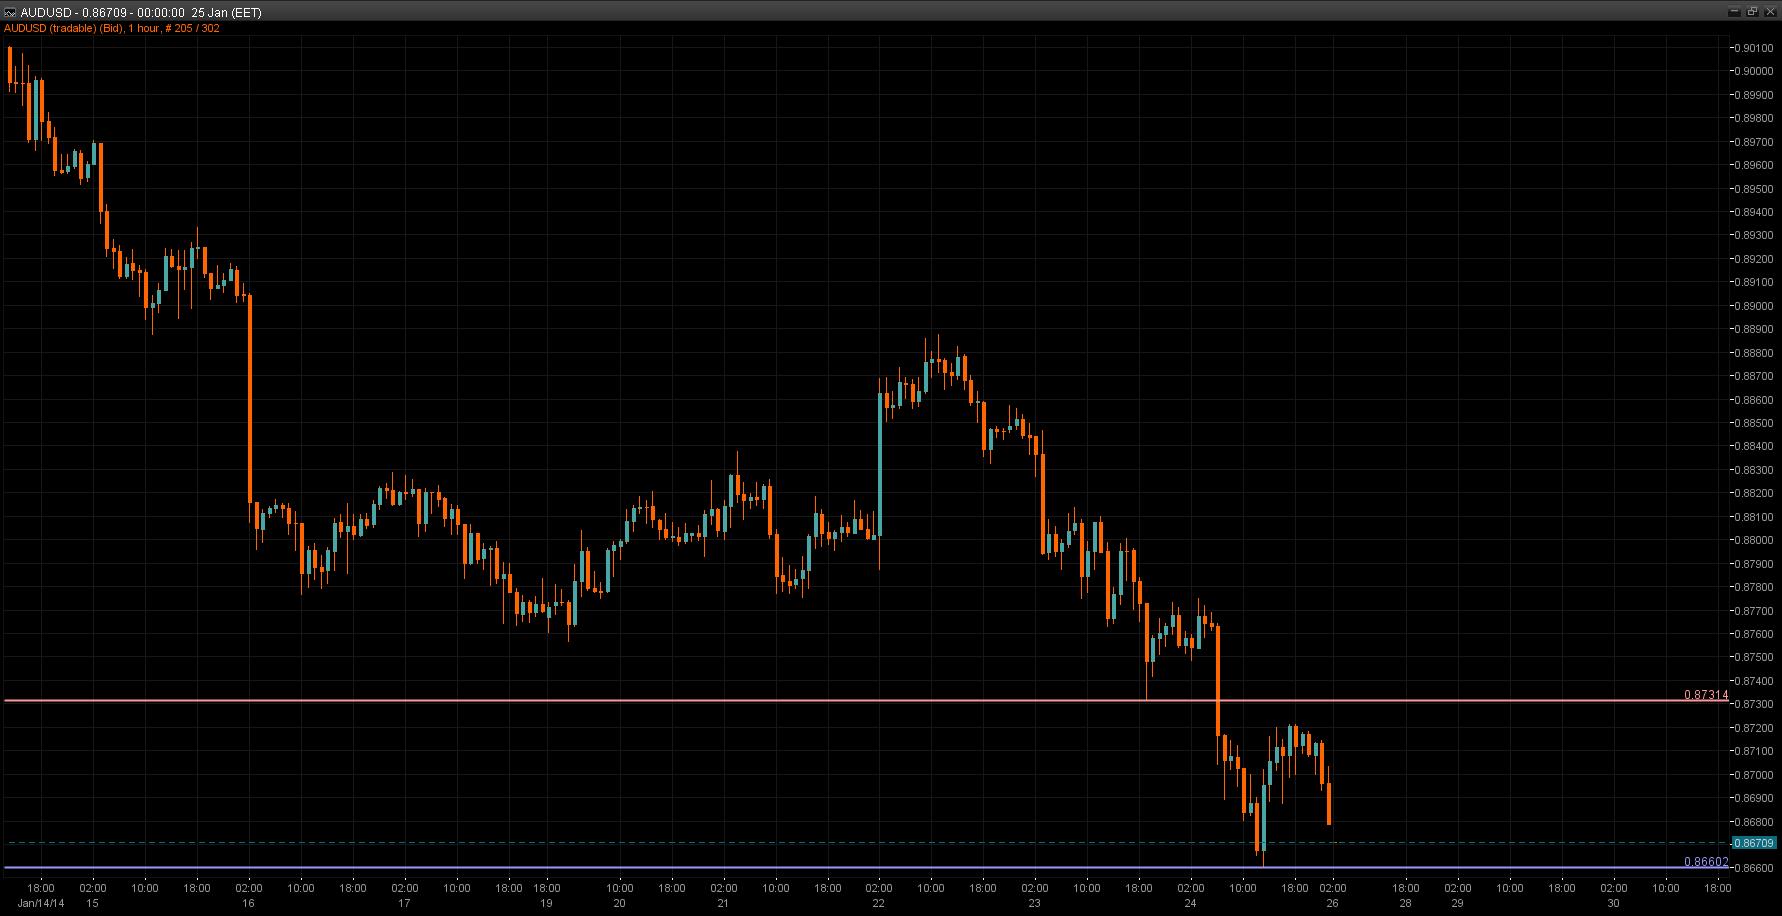 AUD/USD Chart 26 Dec 2014